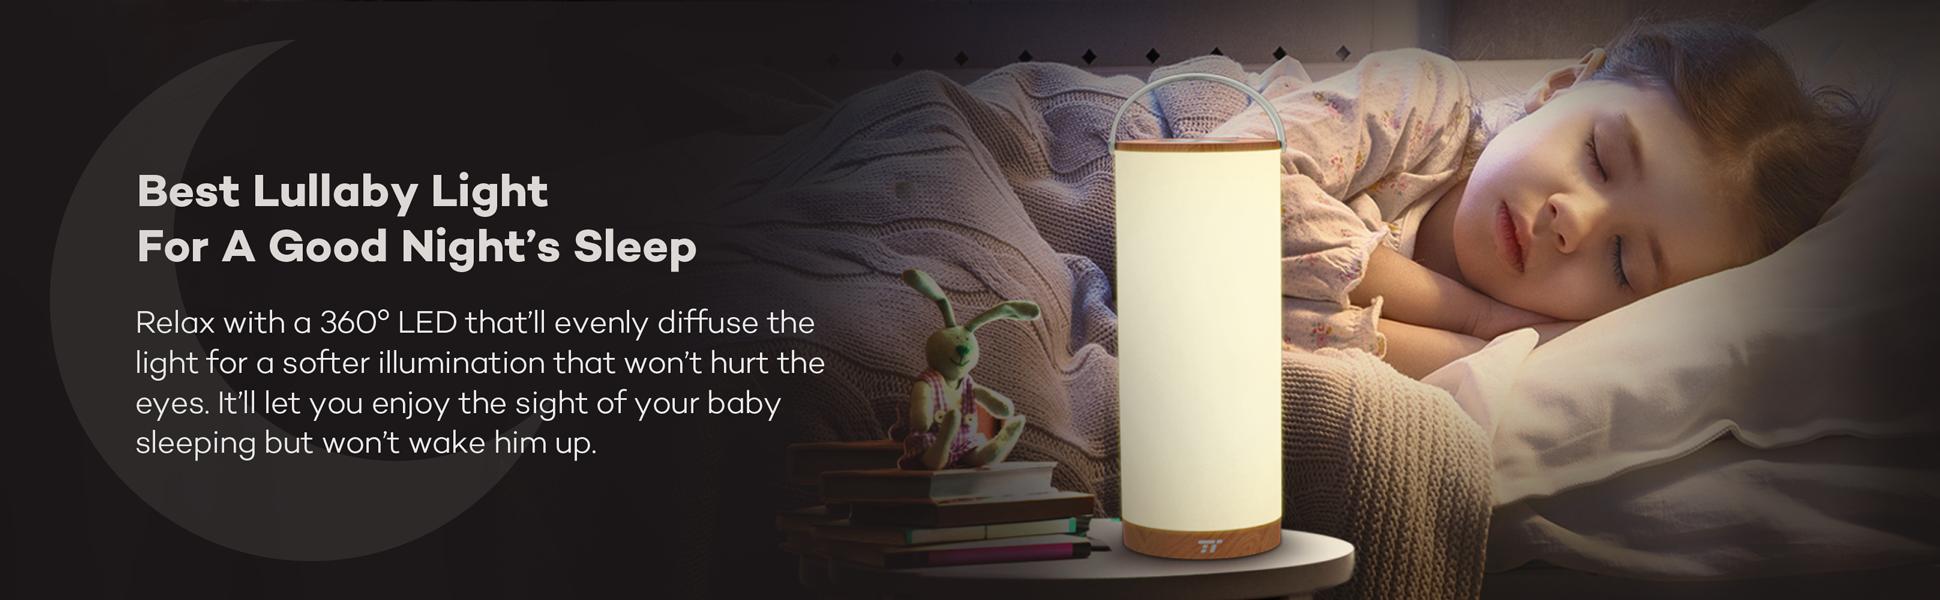 TaoTronics Rechargeable Touch Sensor Bedside Lamp, LED